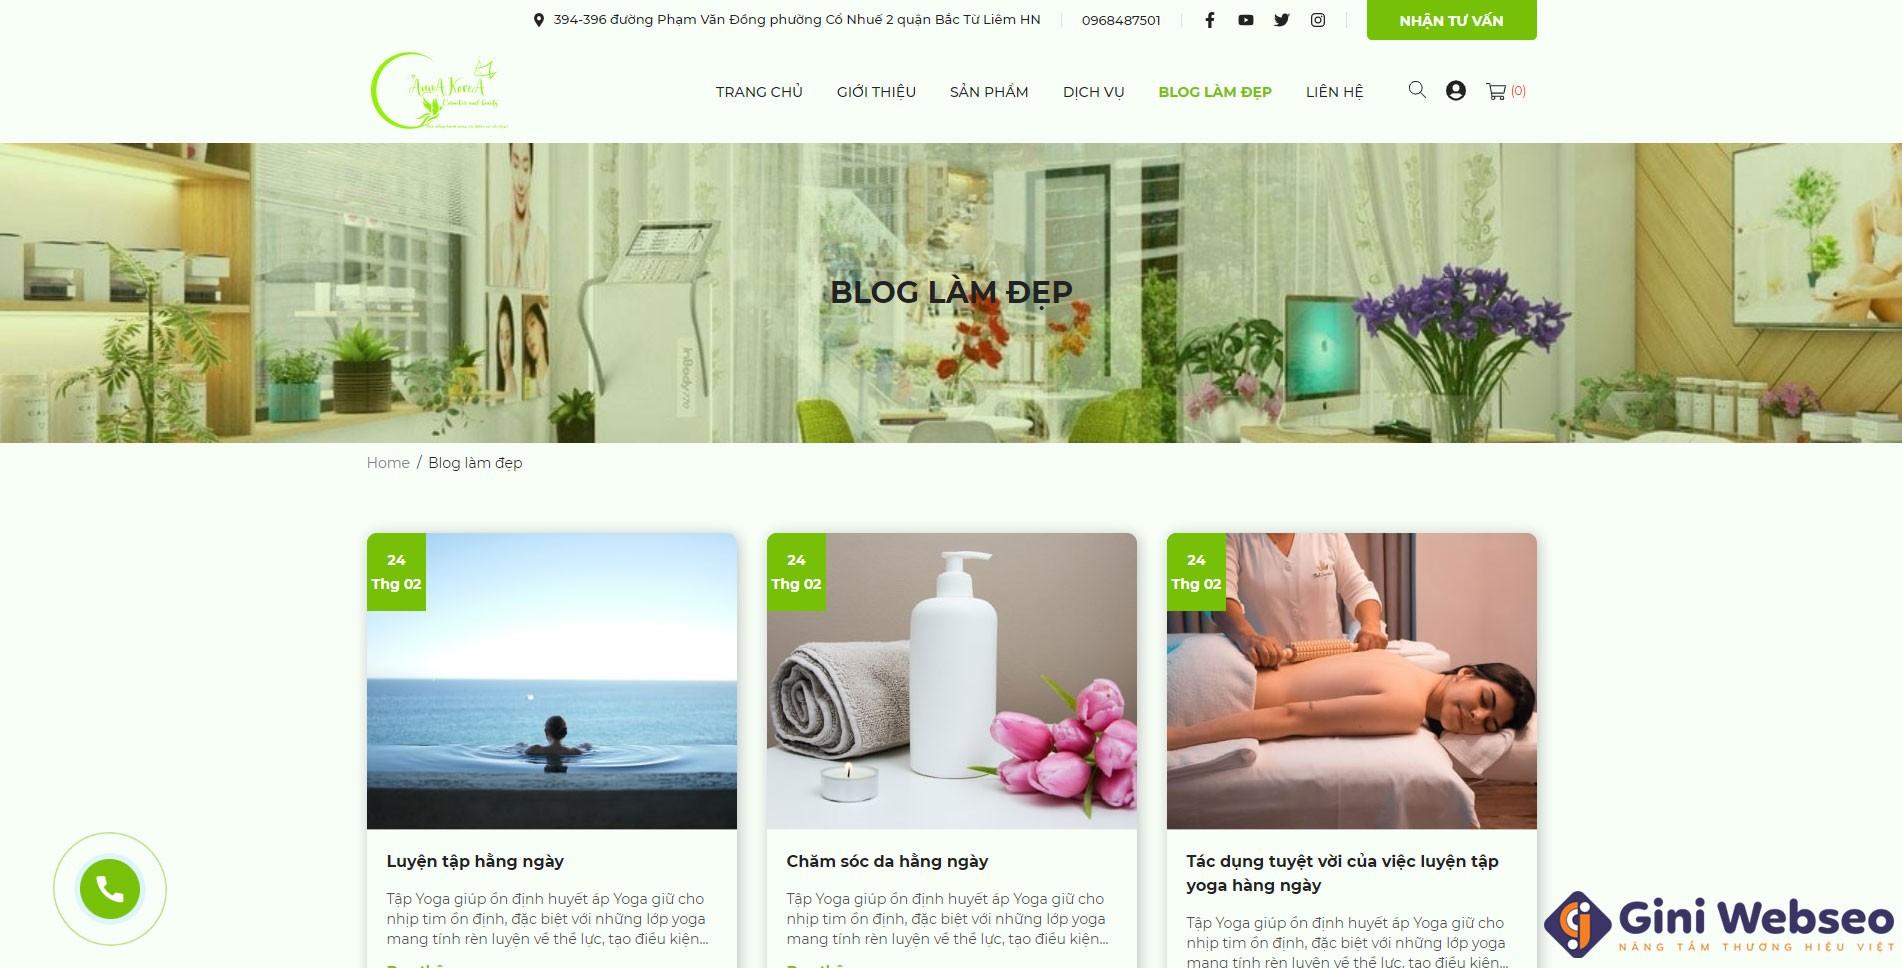 Giao diện trang chủ thiết kế website spa